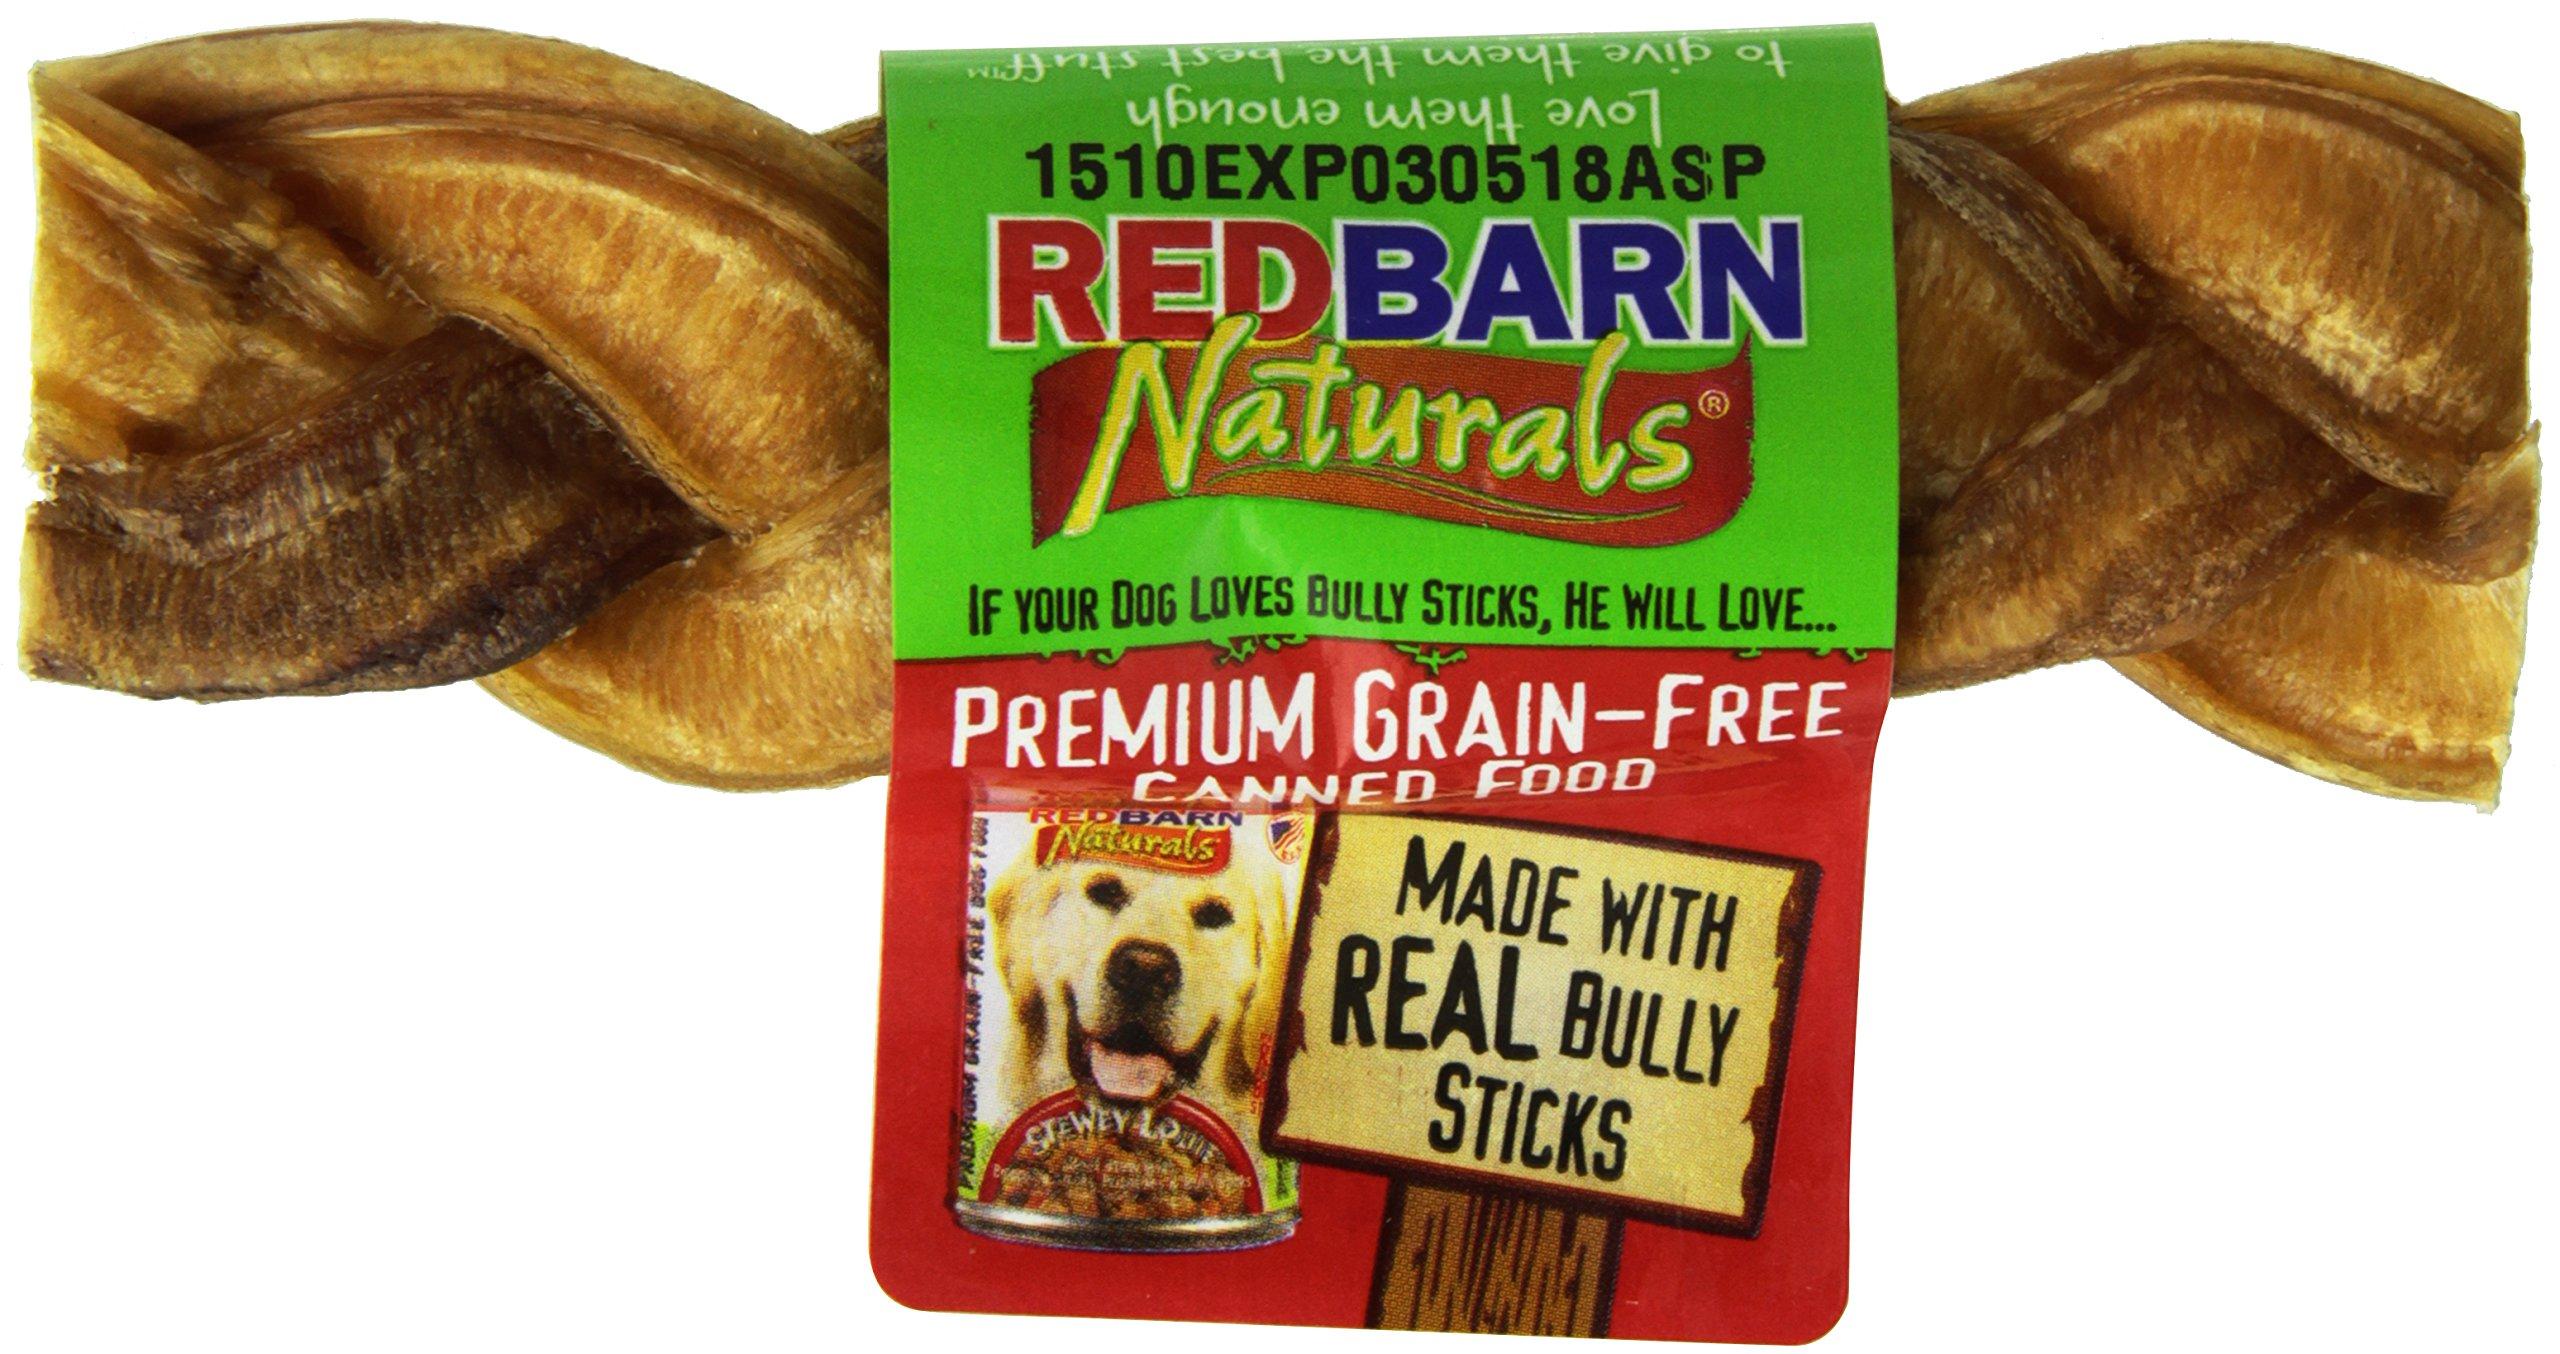 Redbarn Braided Bully Sticks 5'' Dog Treats, 5-in chew, case of 30